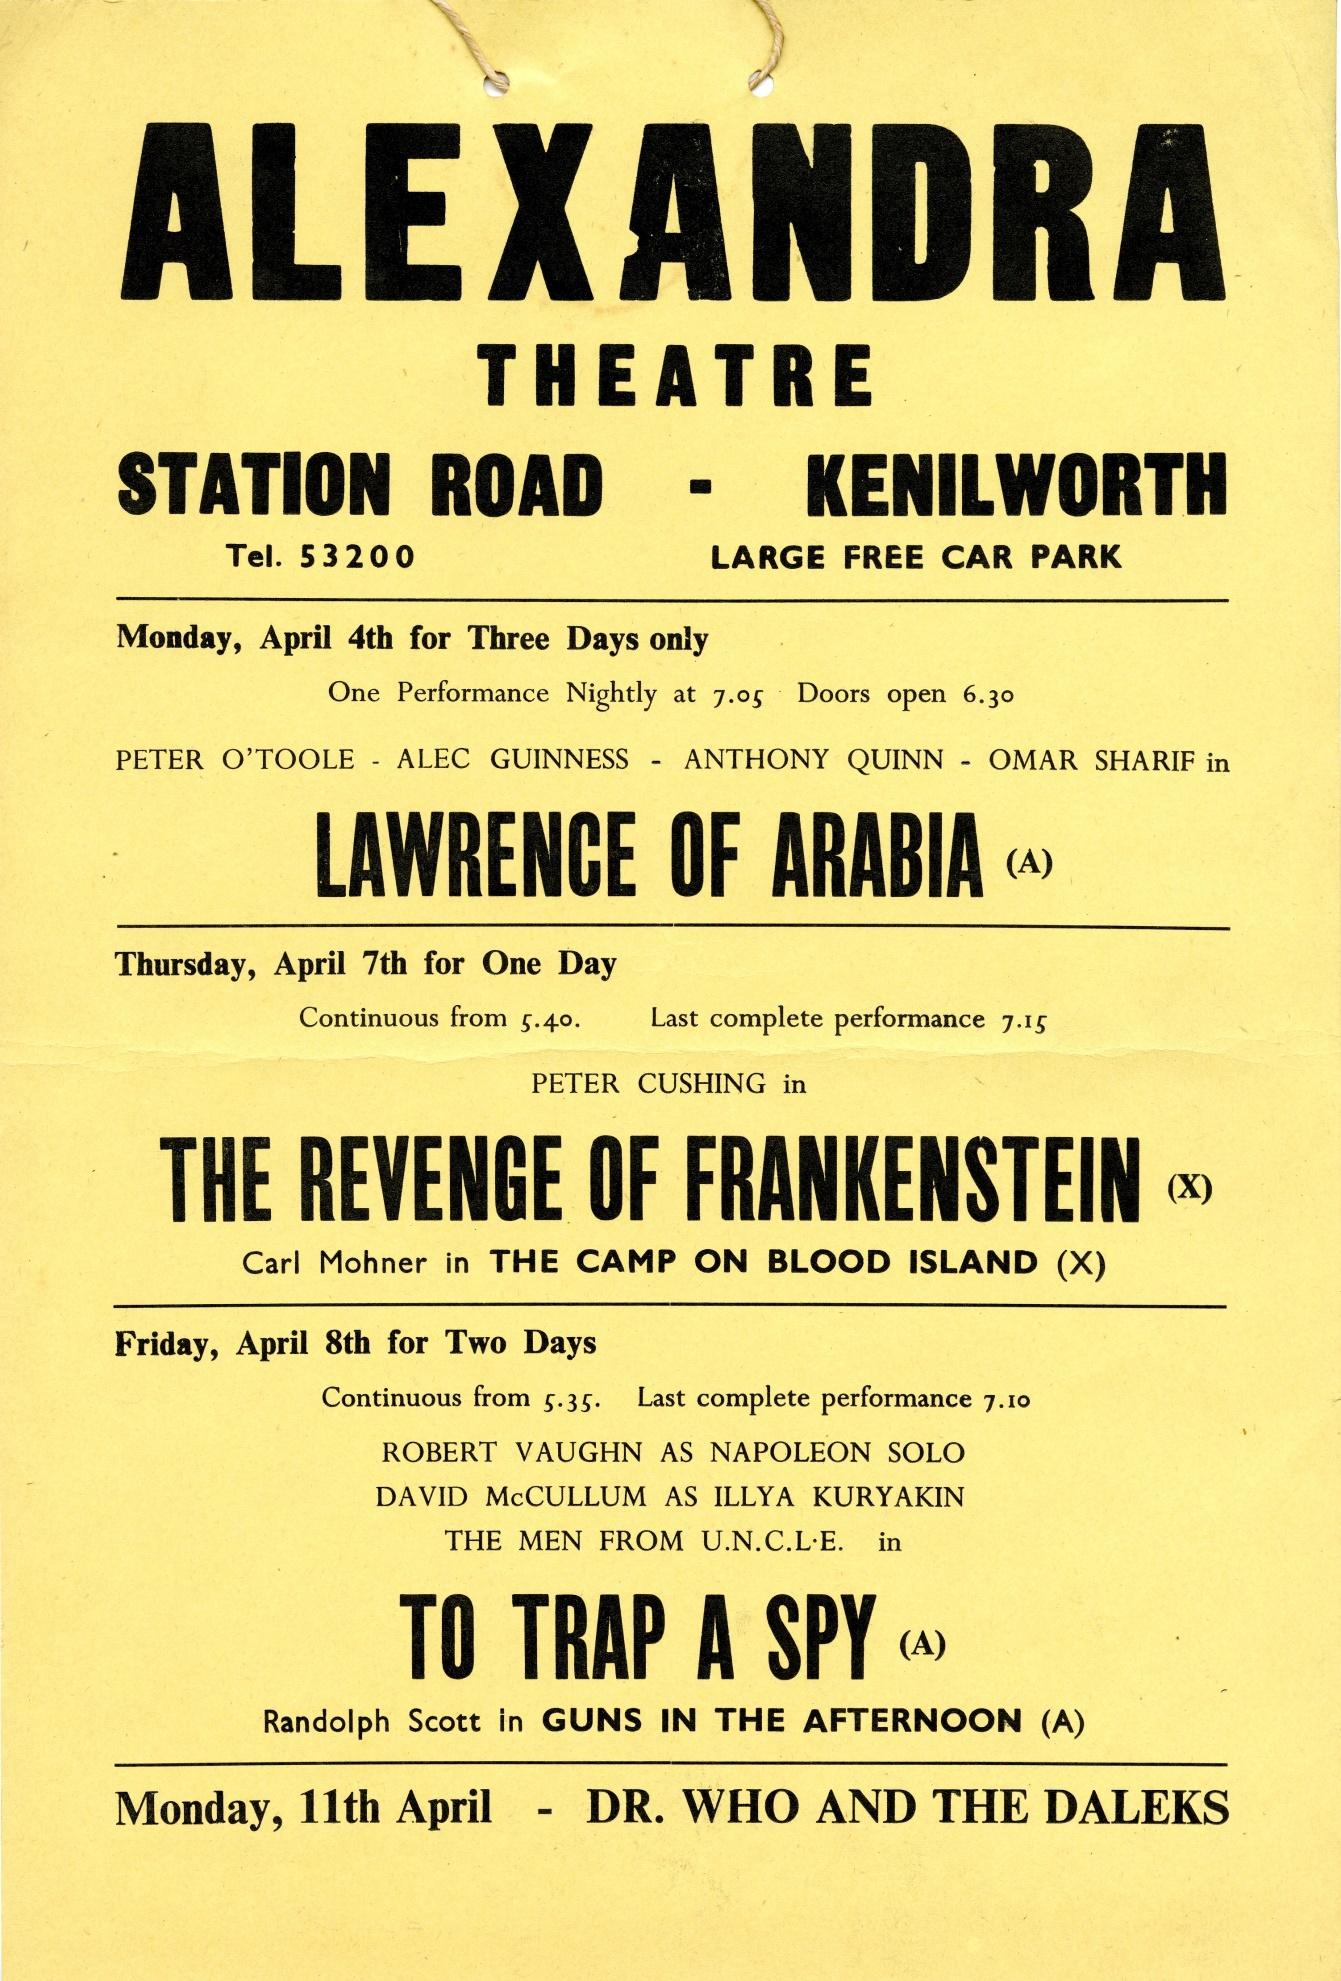 Advance Notice Playbill, Alexandra Theatre, Kenilworth